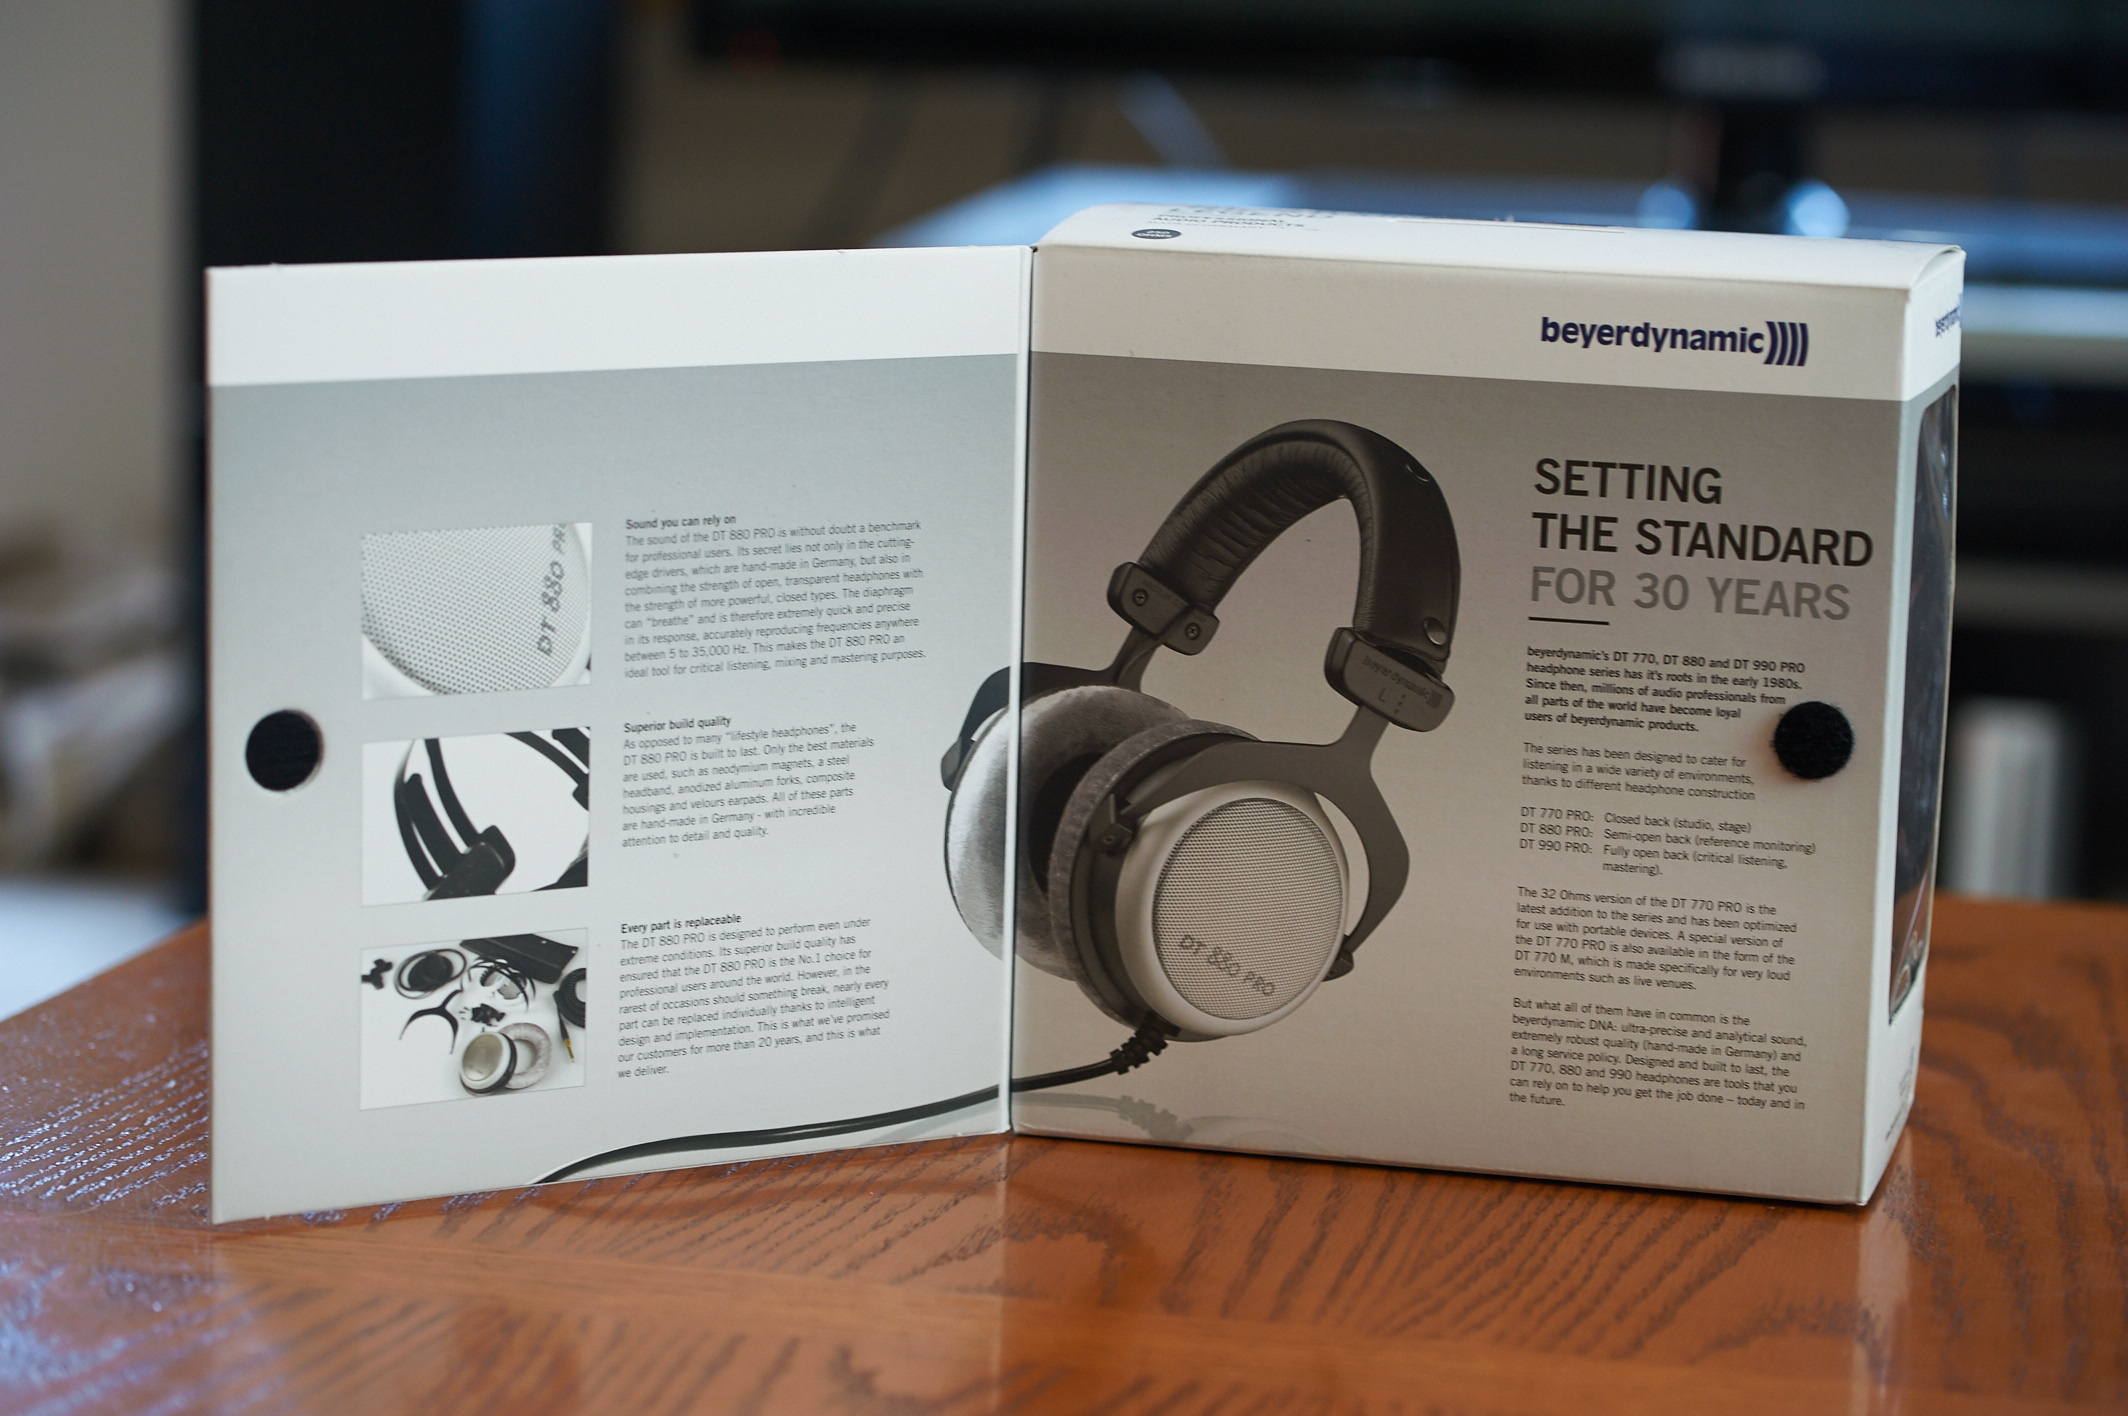 c9cb47fe7b9 Beyerdynamic DT 880 Pro 250 OHM Semi-open reference headphone ...